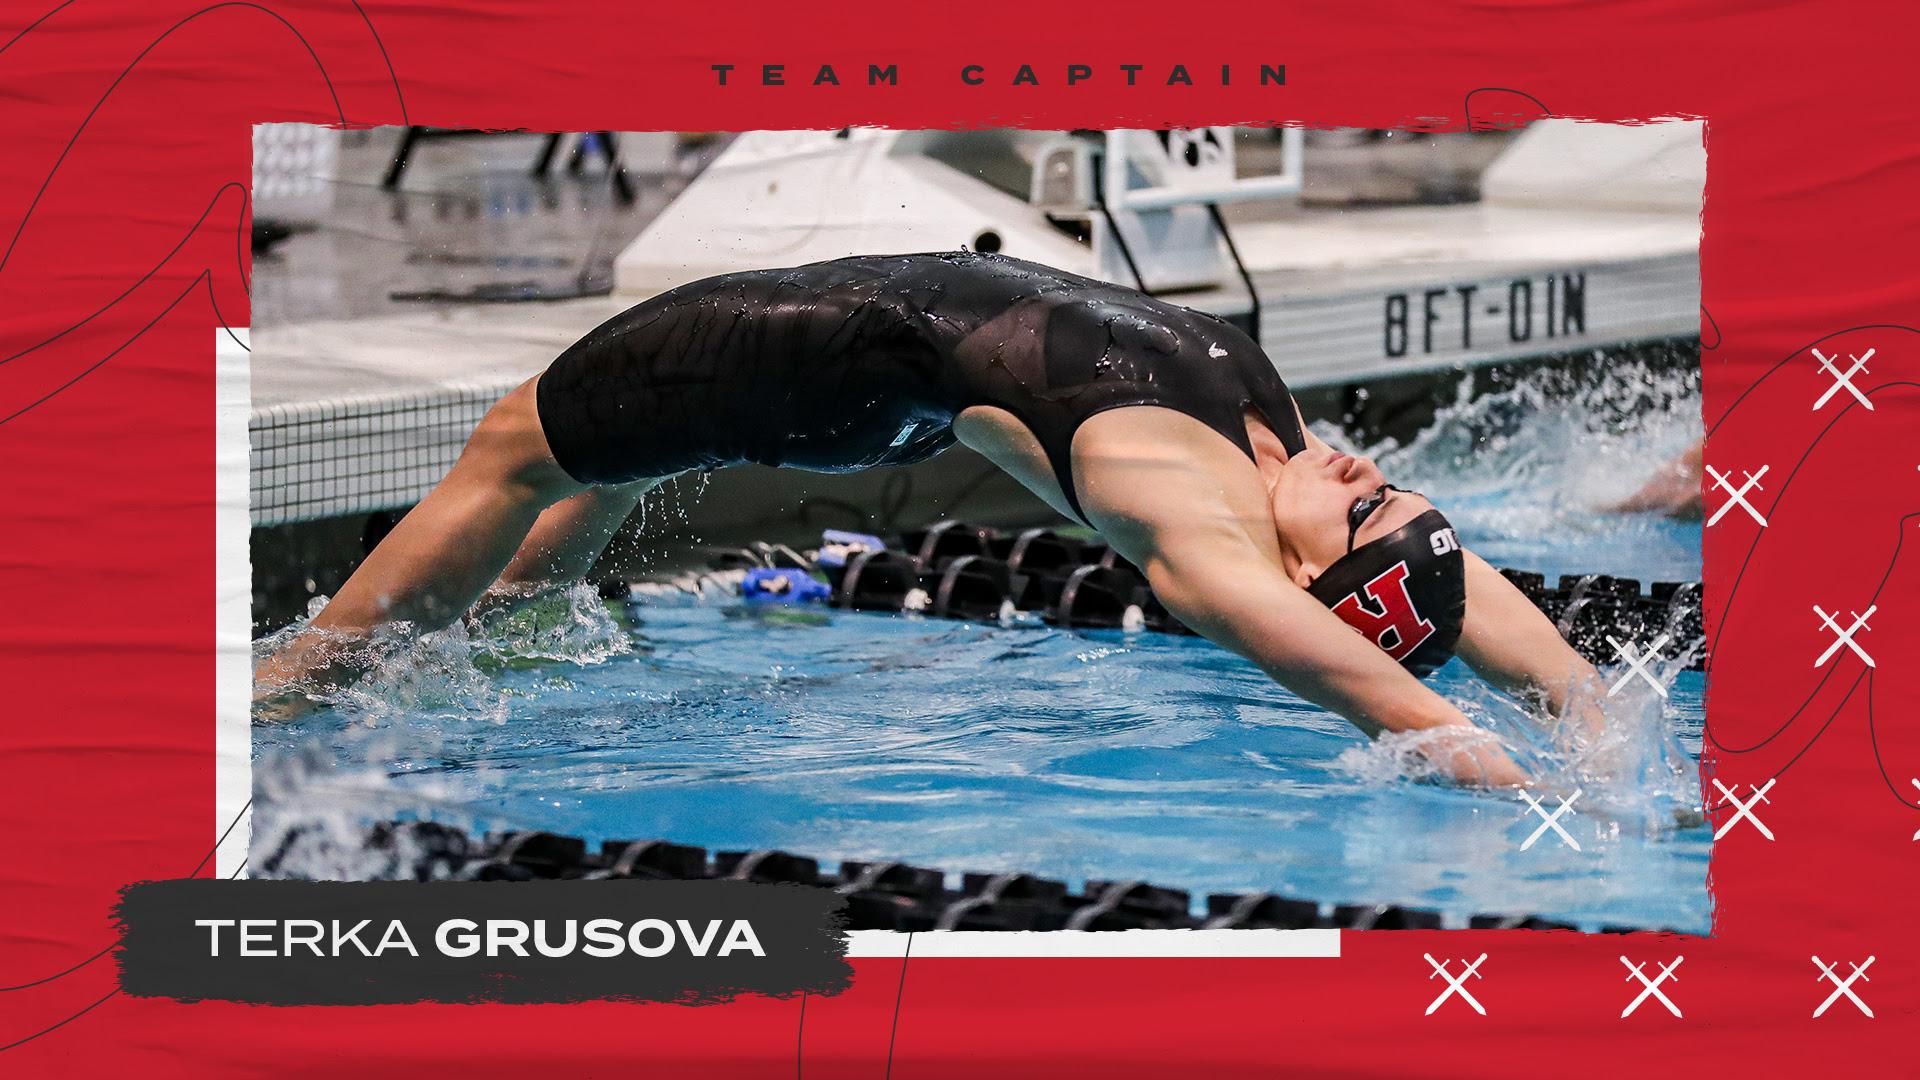 Terka Grusova Captains